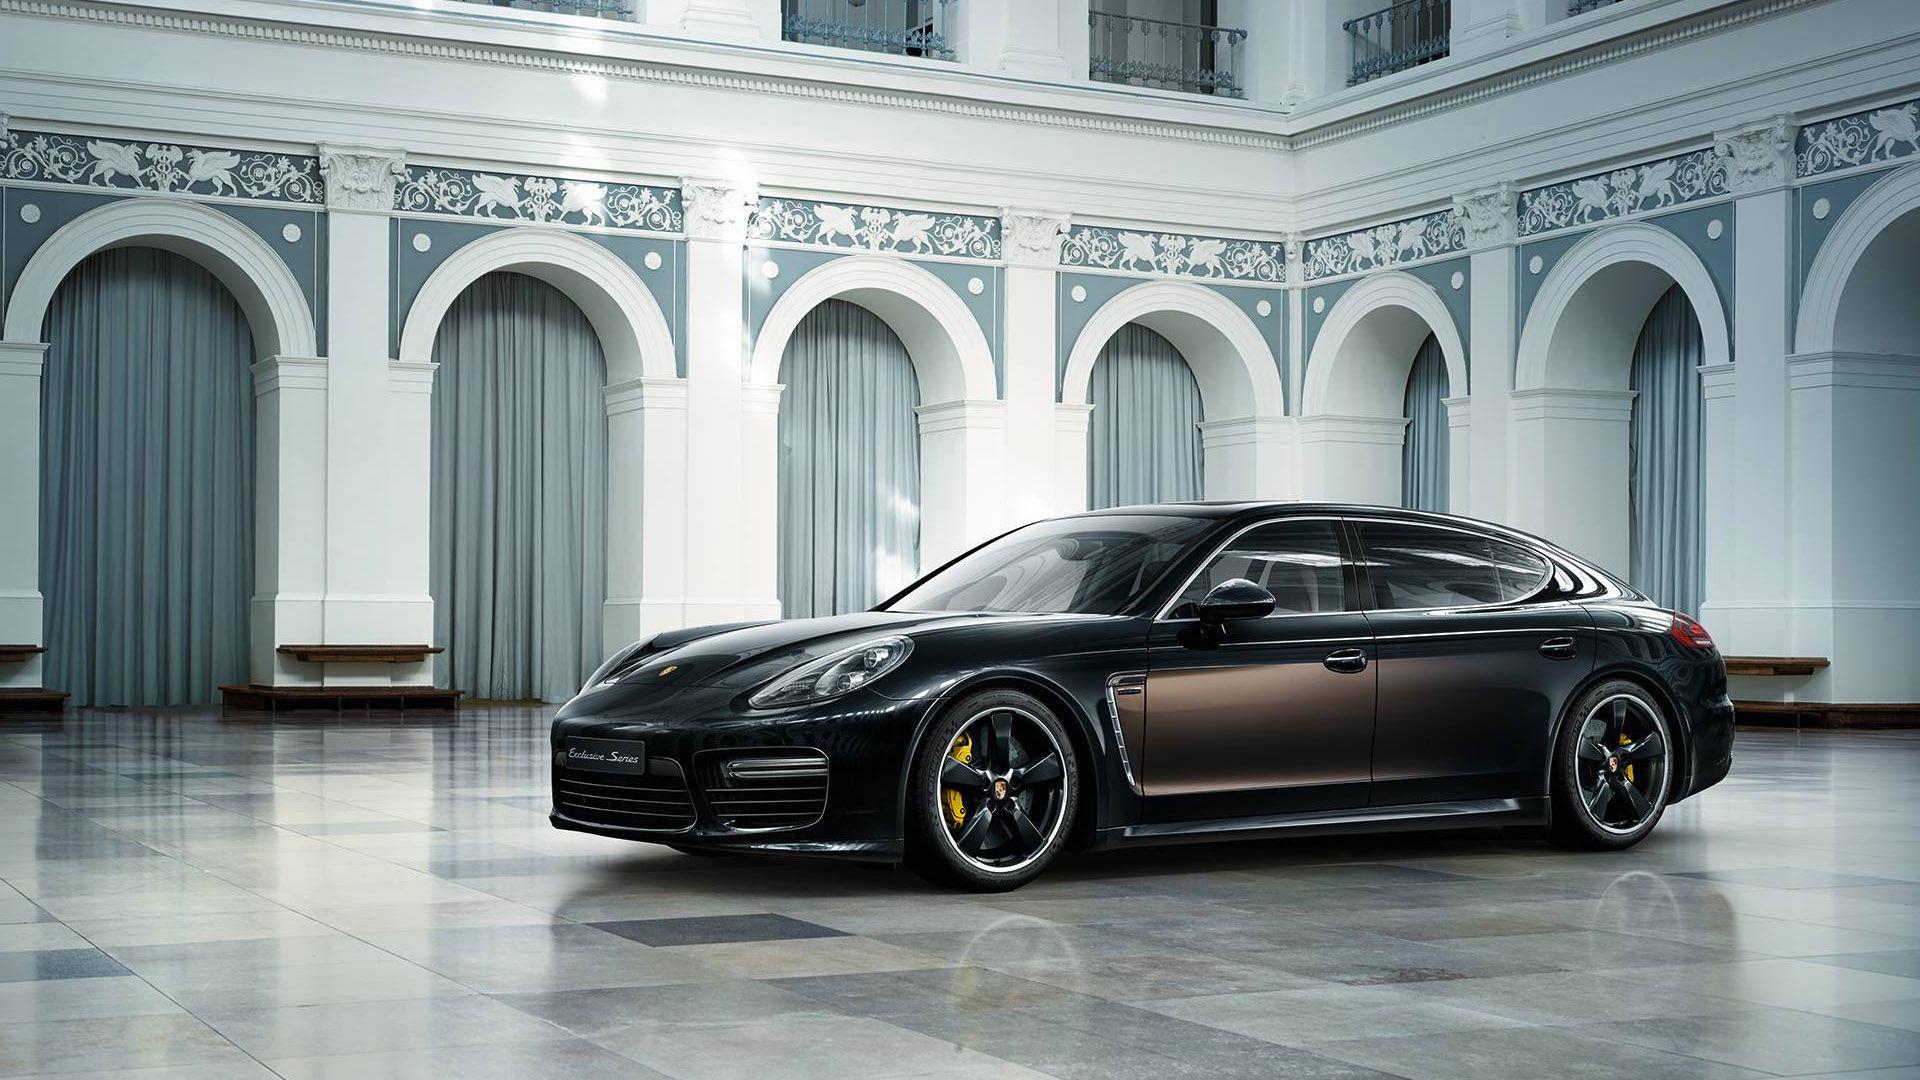 2015 Porsche Panamera Turbo S Exclusive Series